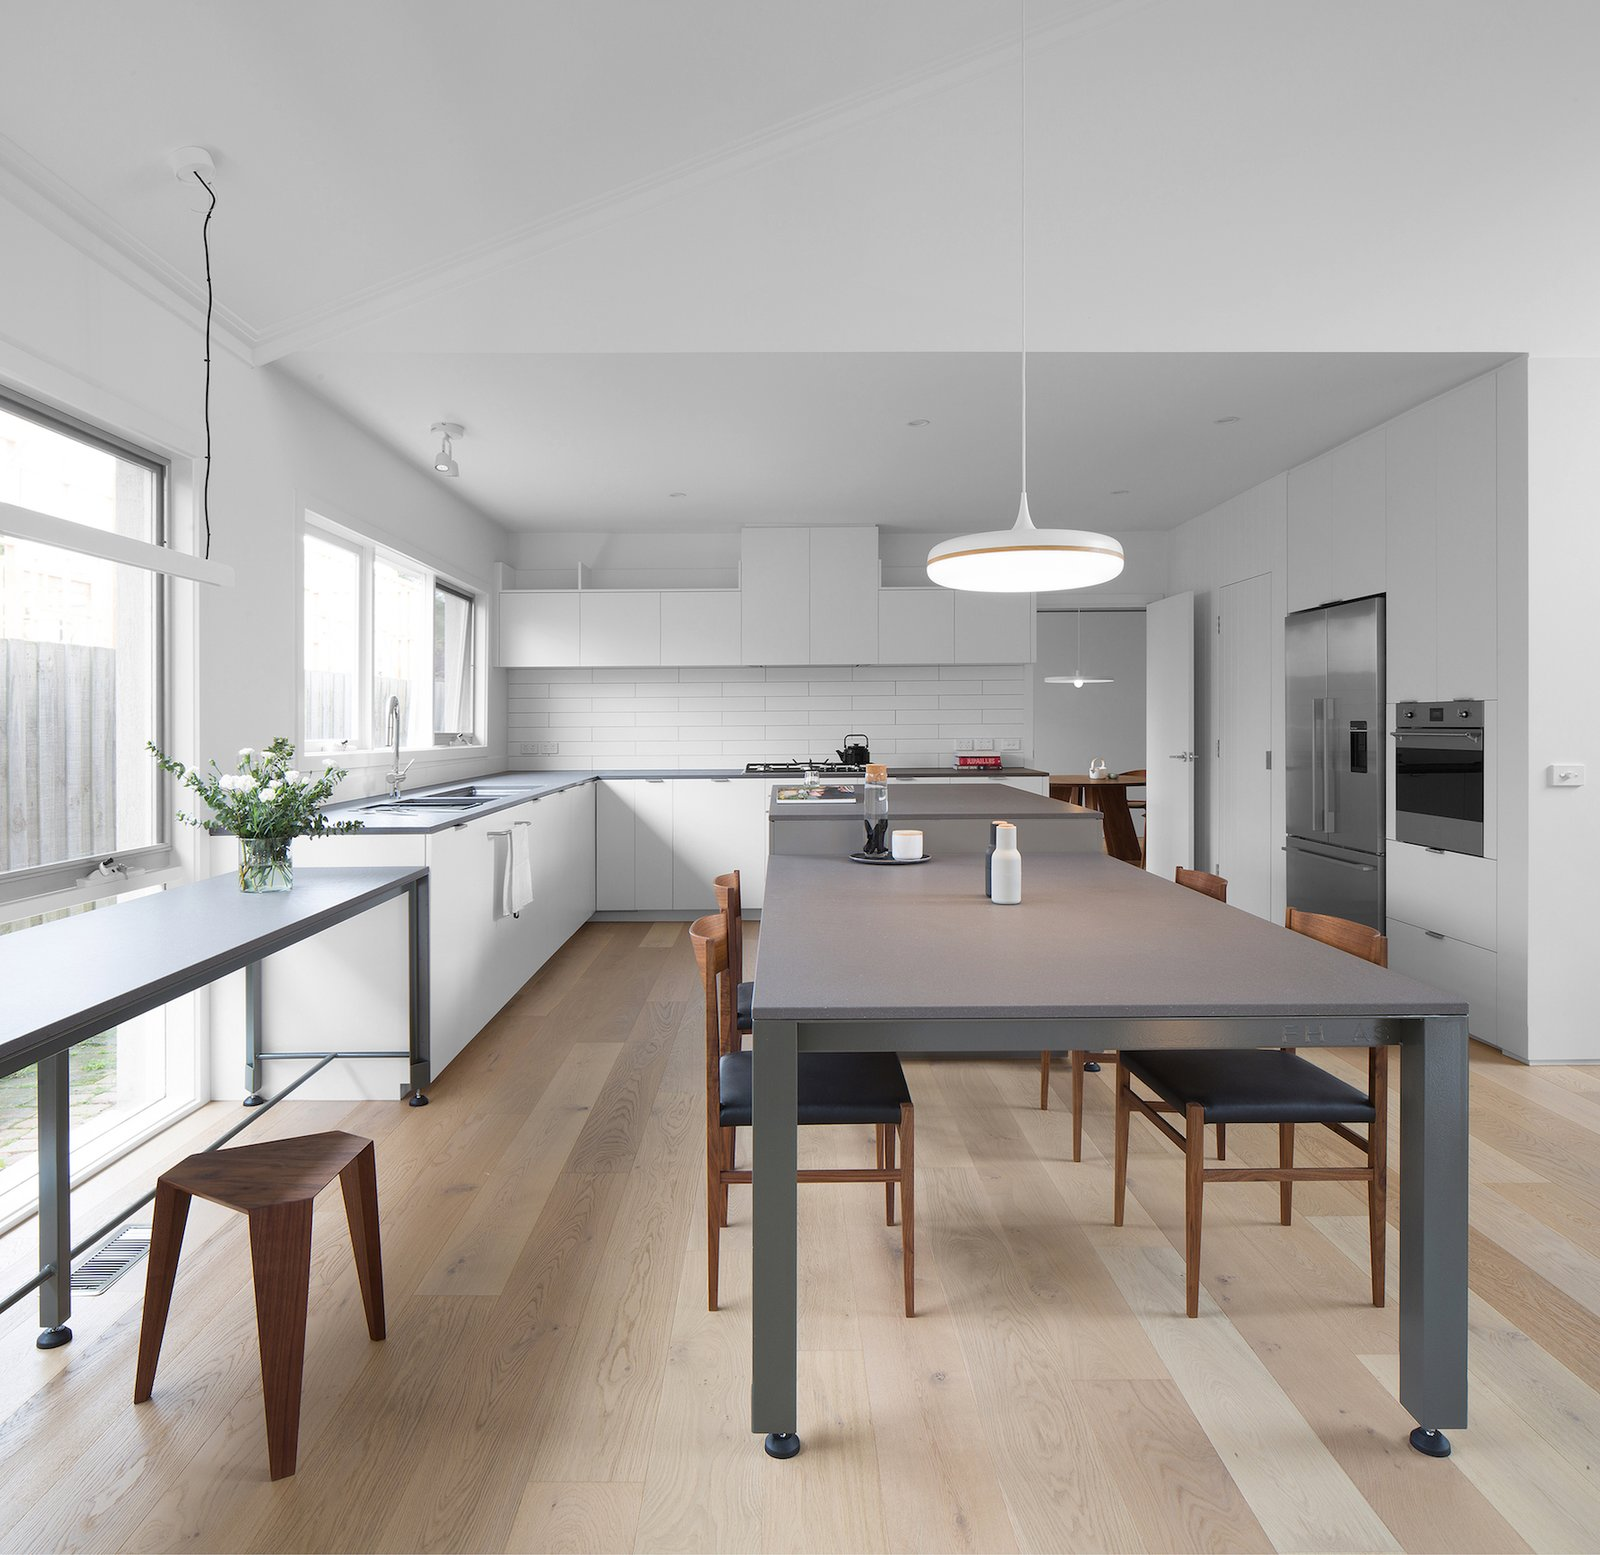 Kitchen, Subway Tile Backsplashe, White Cabinet, Light Hardwood Floor, Granite Counter, Pendant Lighting, Refrigerator, Undermount Sink, Wall Oven, and Range  Corhampton Rd Residence